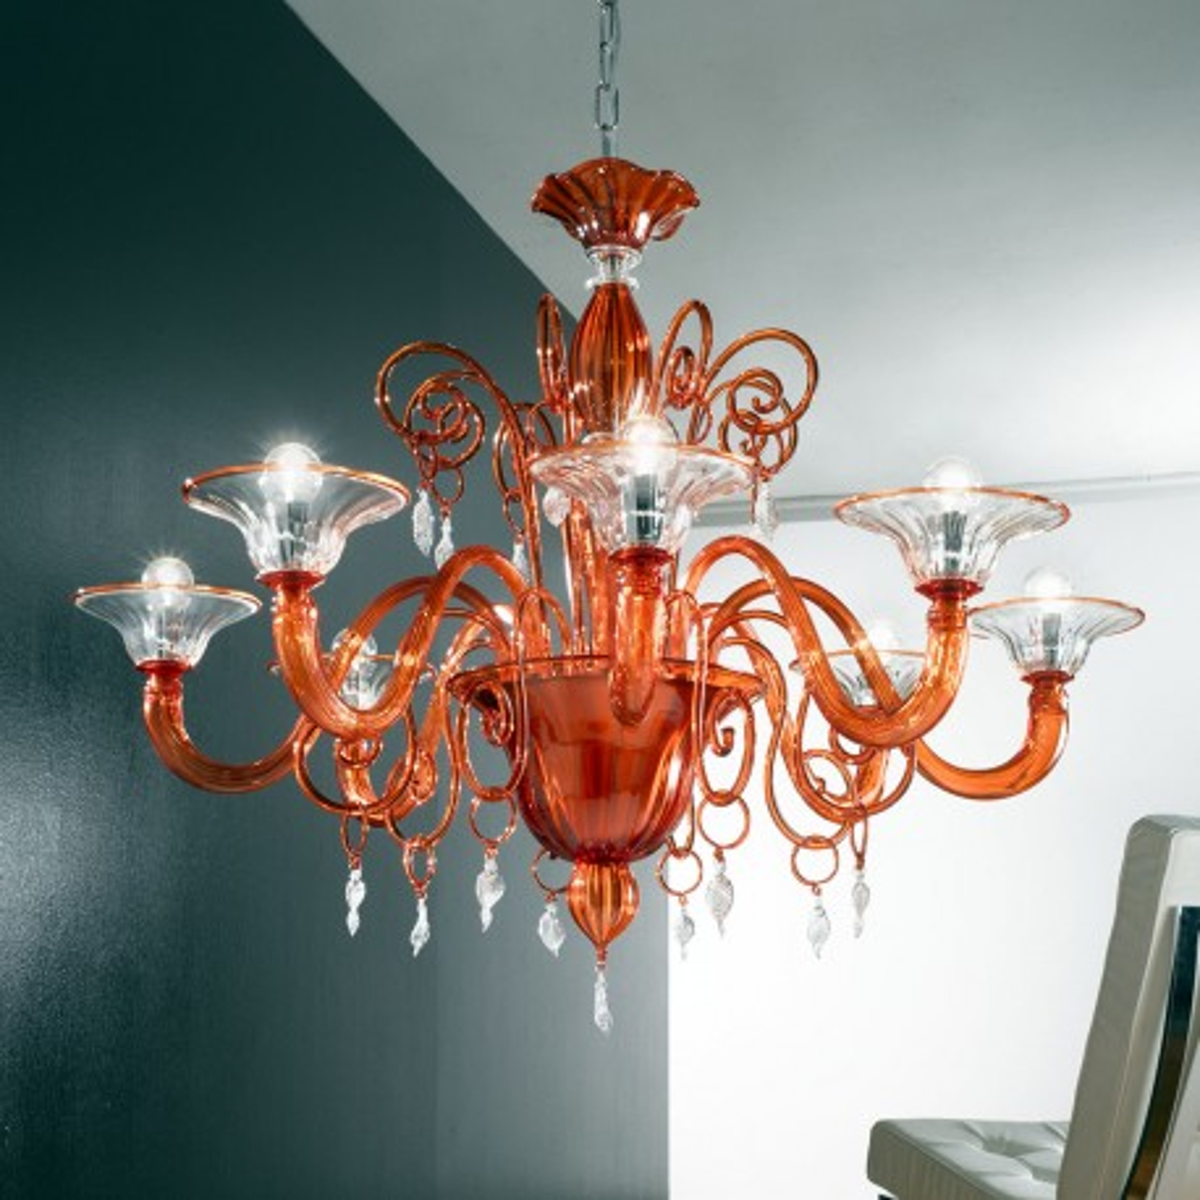 """Taric"" lampara de araña de Murano - 8 luces - naranja y transparente"